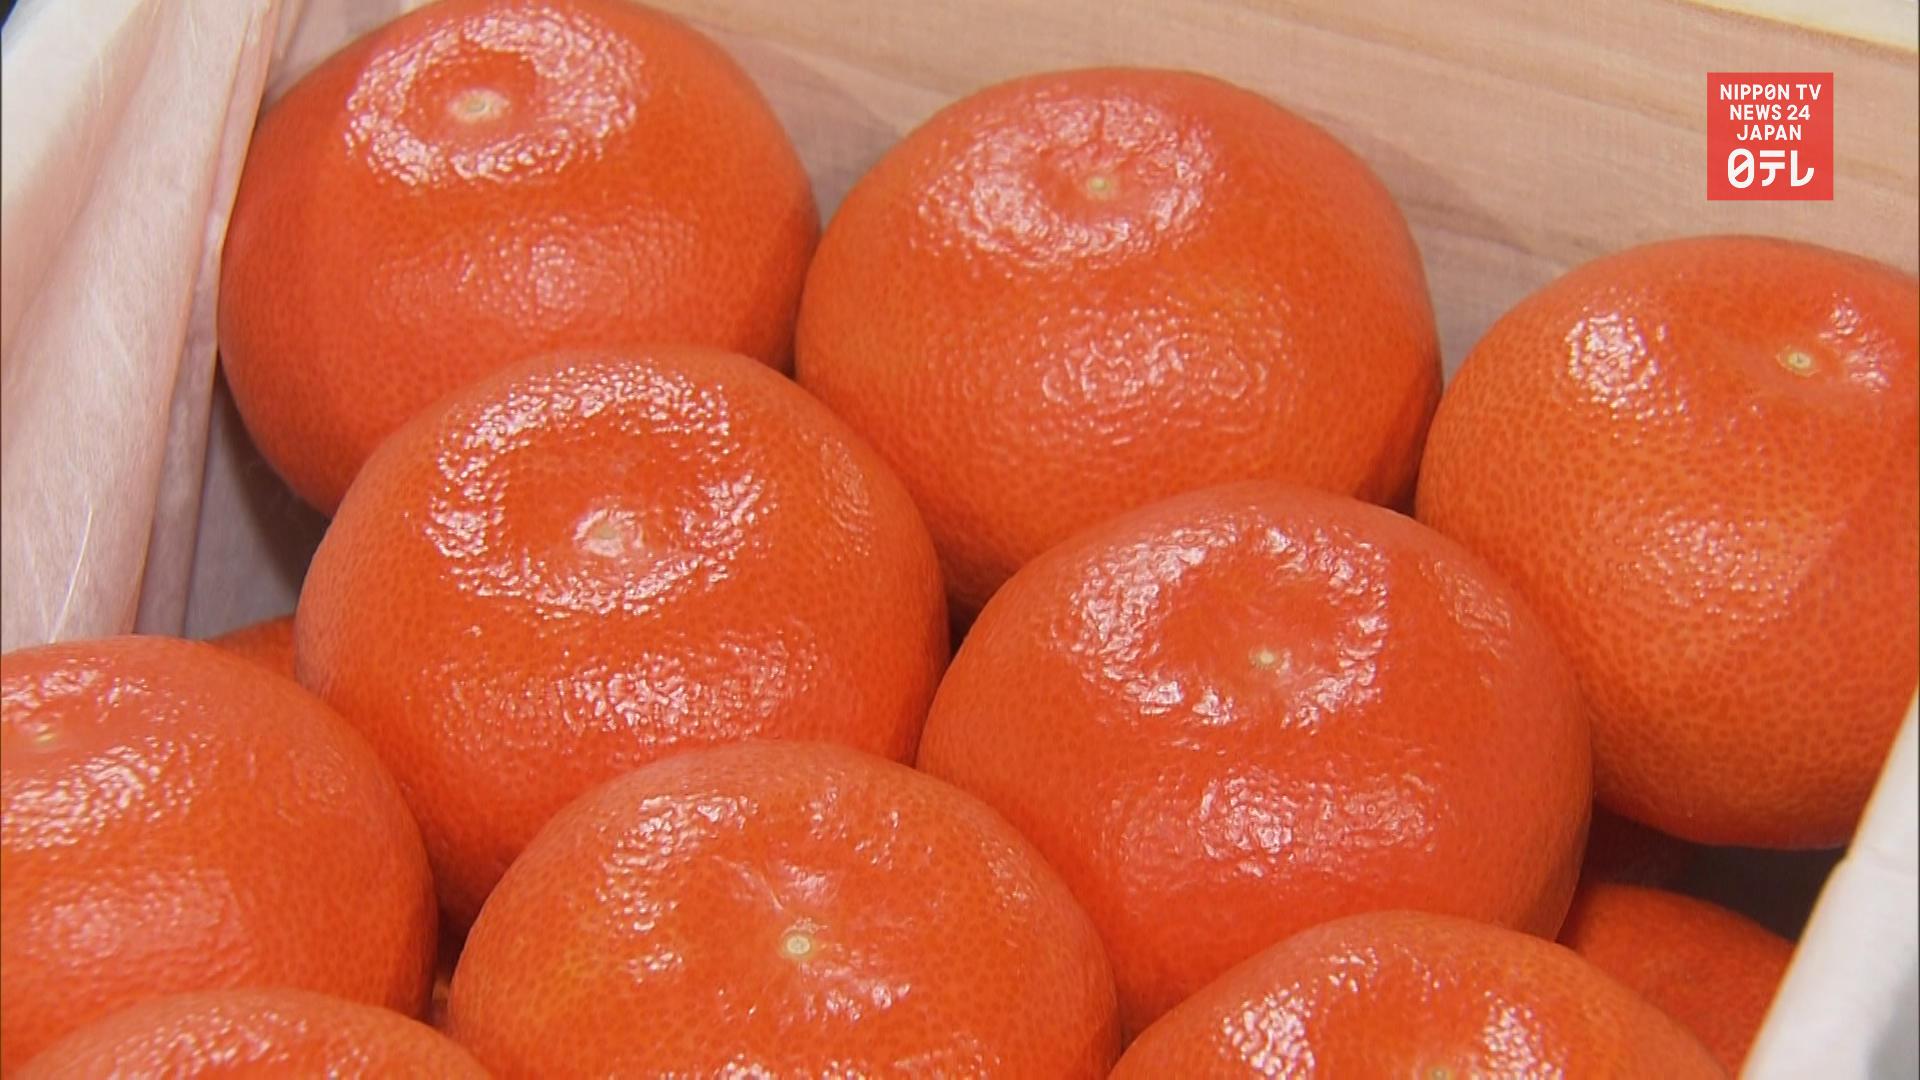 Mandarin oranges fetch record high price